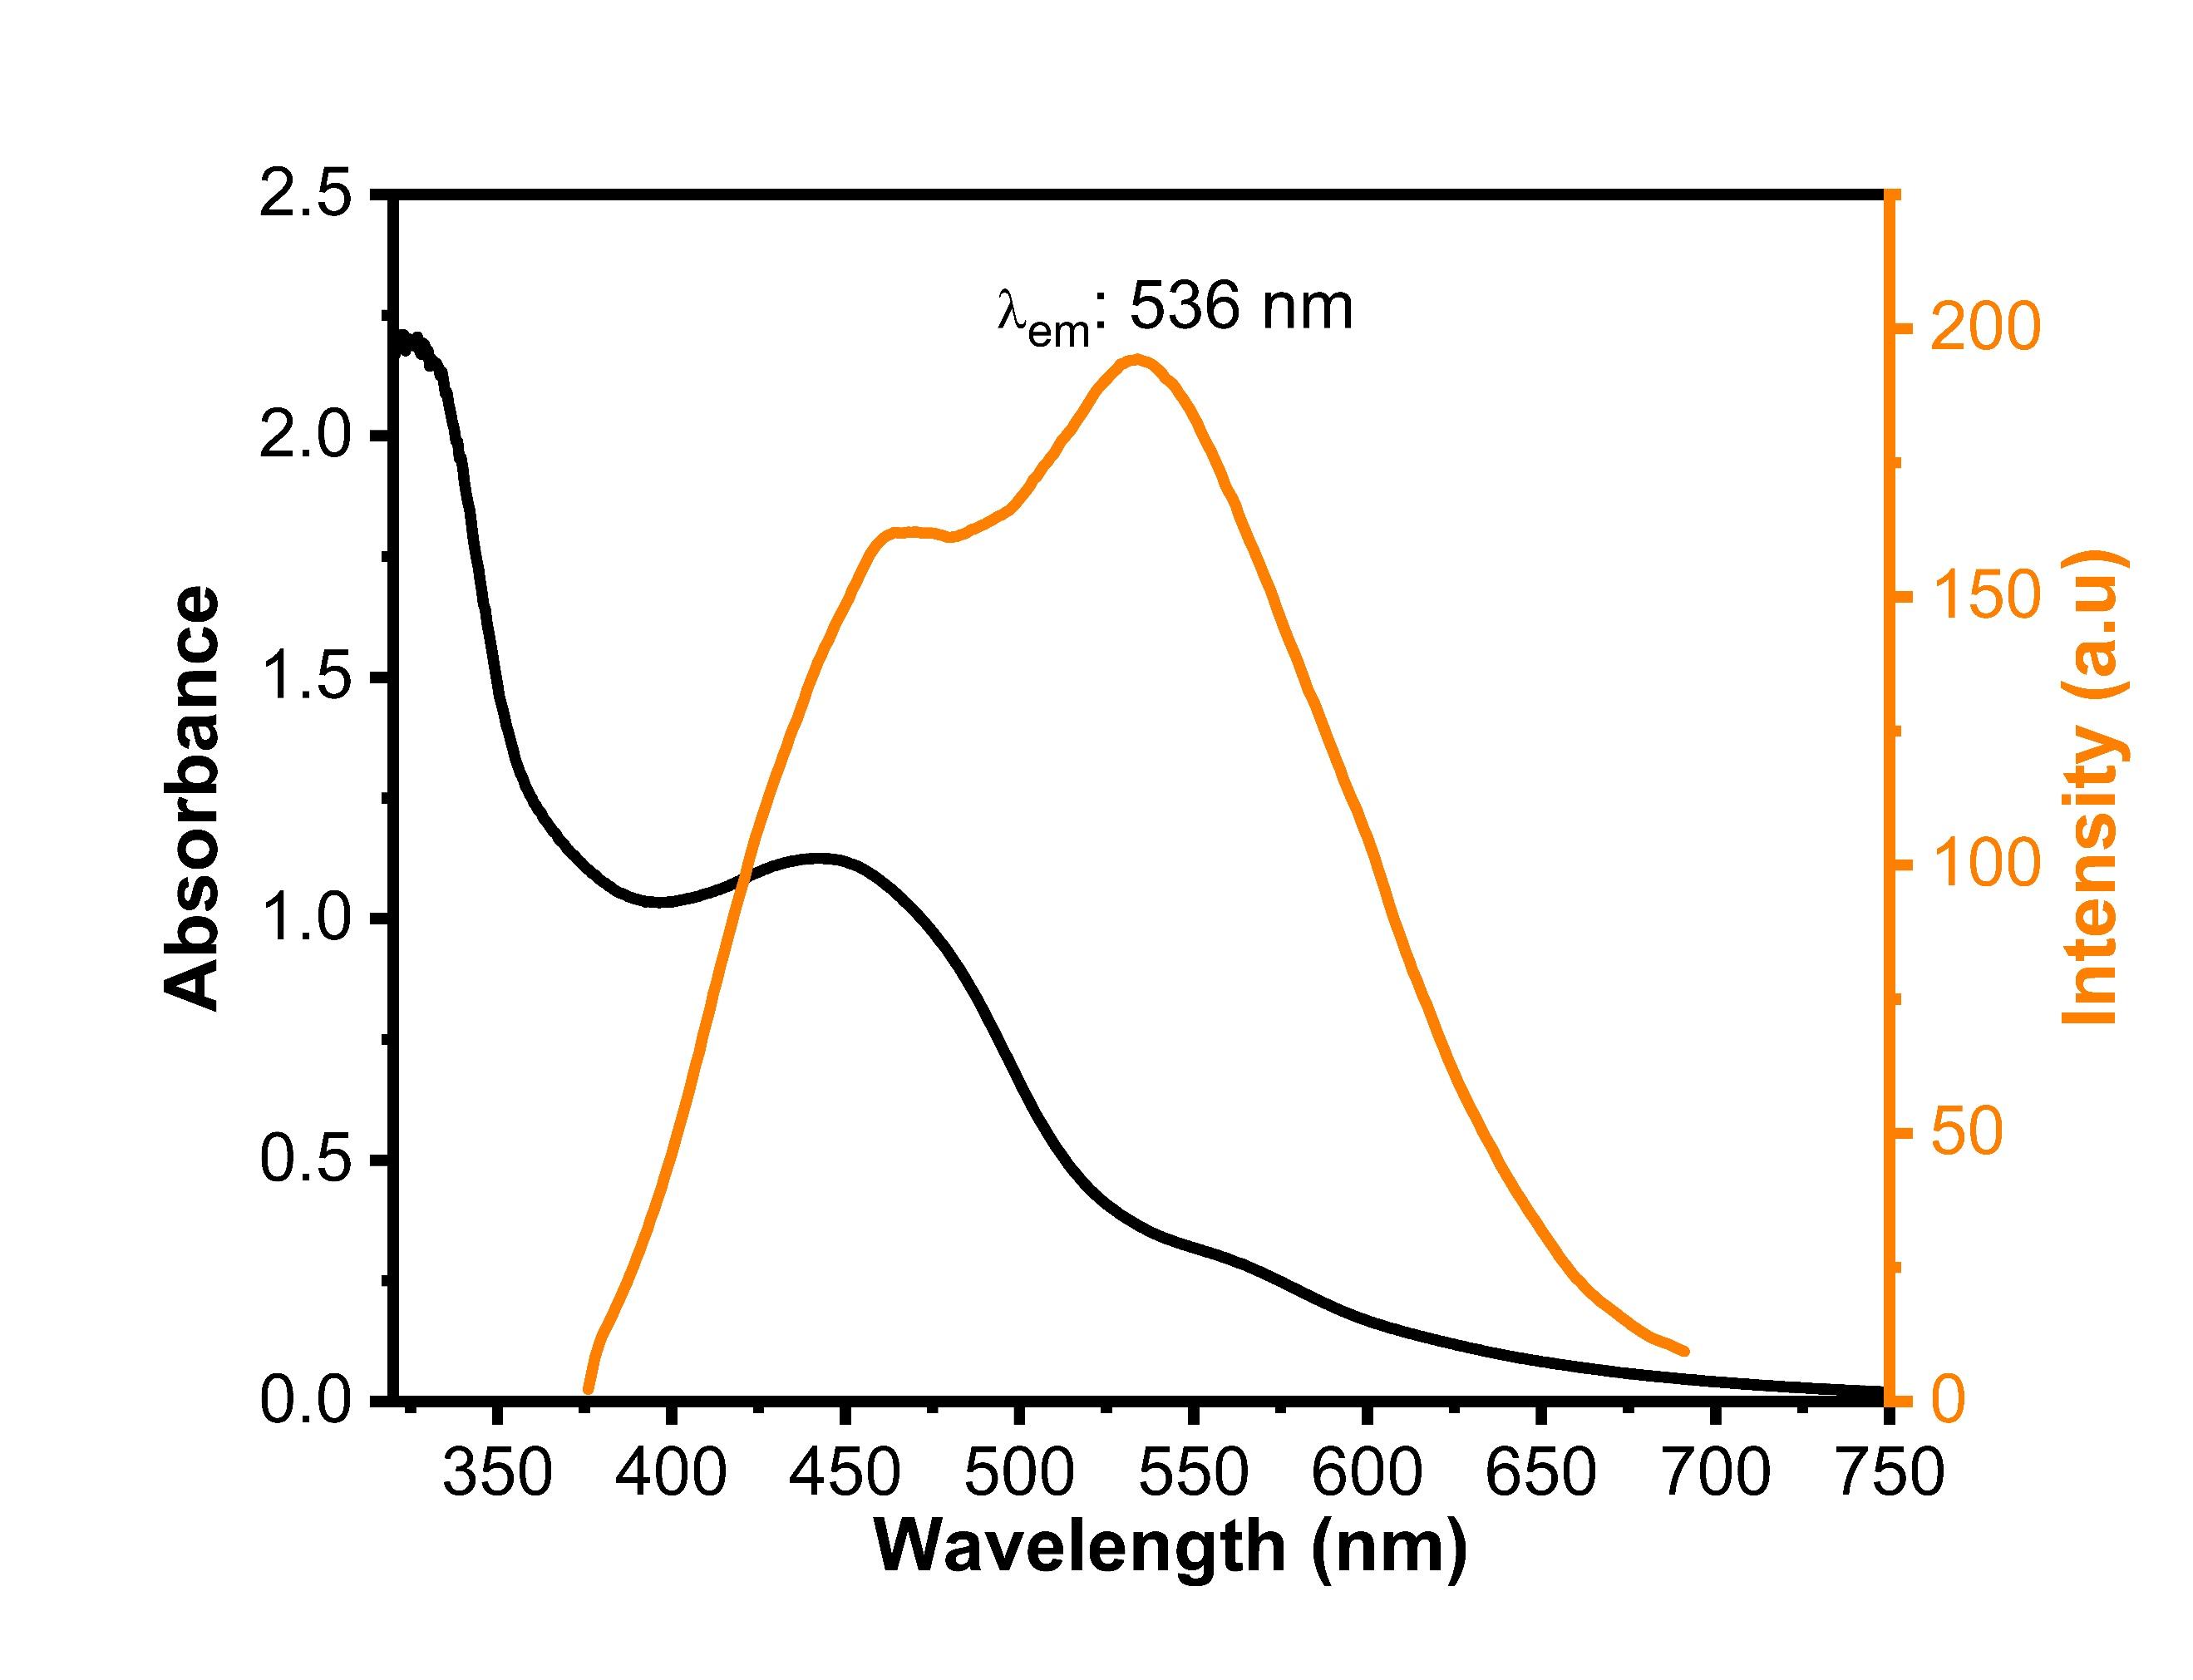 UV/Visand Fluorescence emissionspectras (λexc: 365 nm) of orange carbon quantum dot (o-cqds).